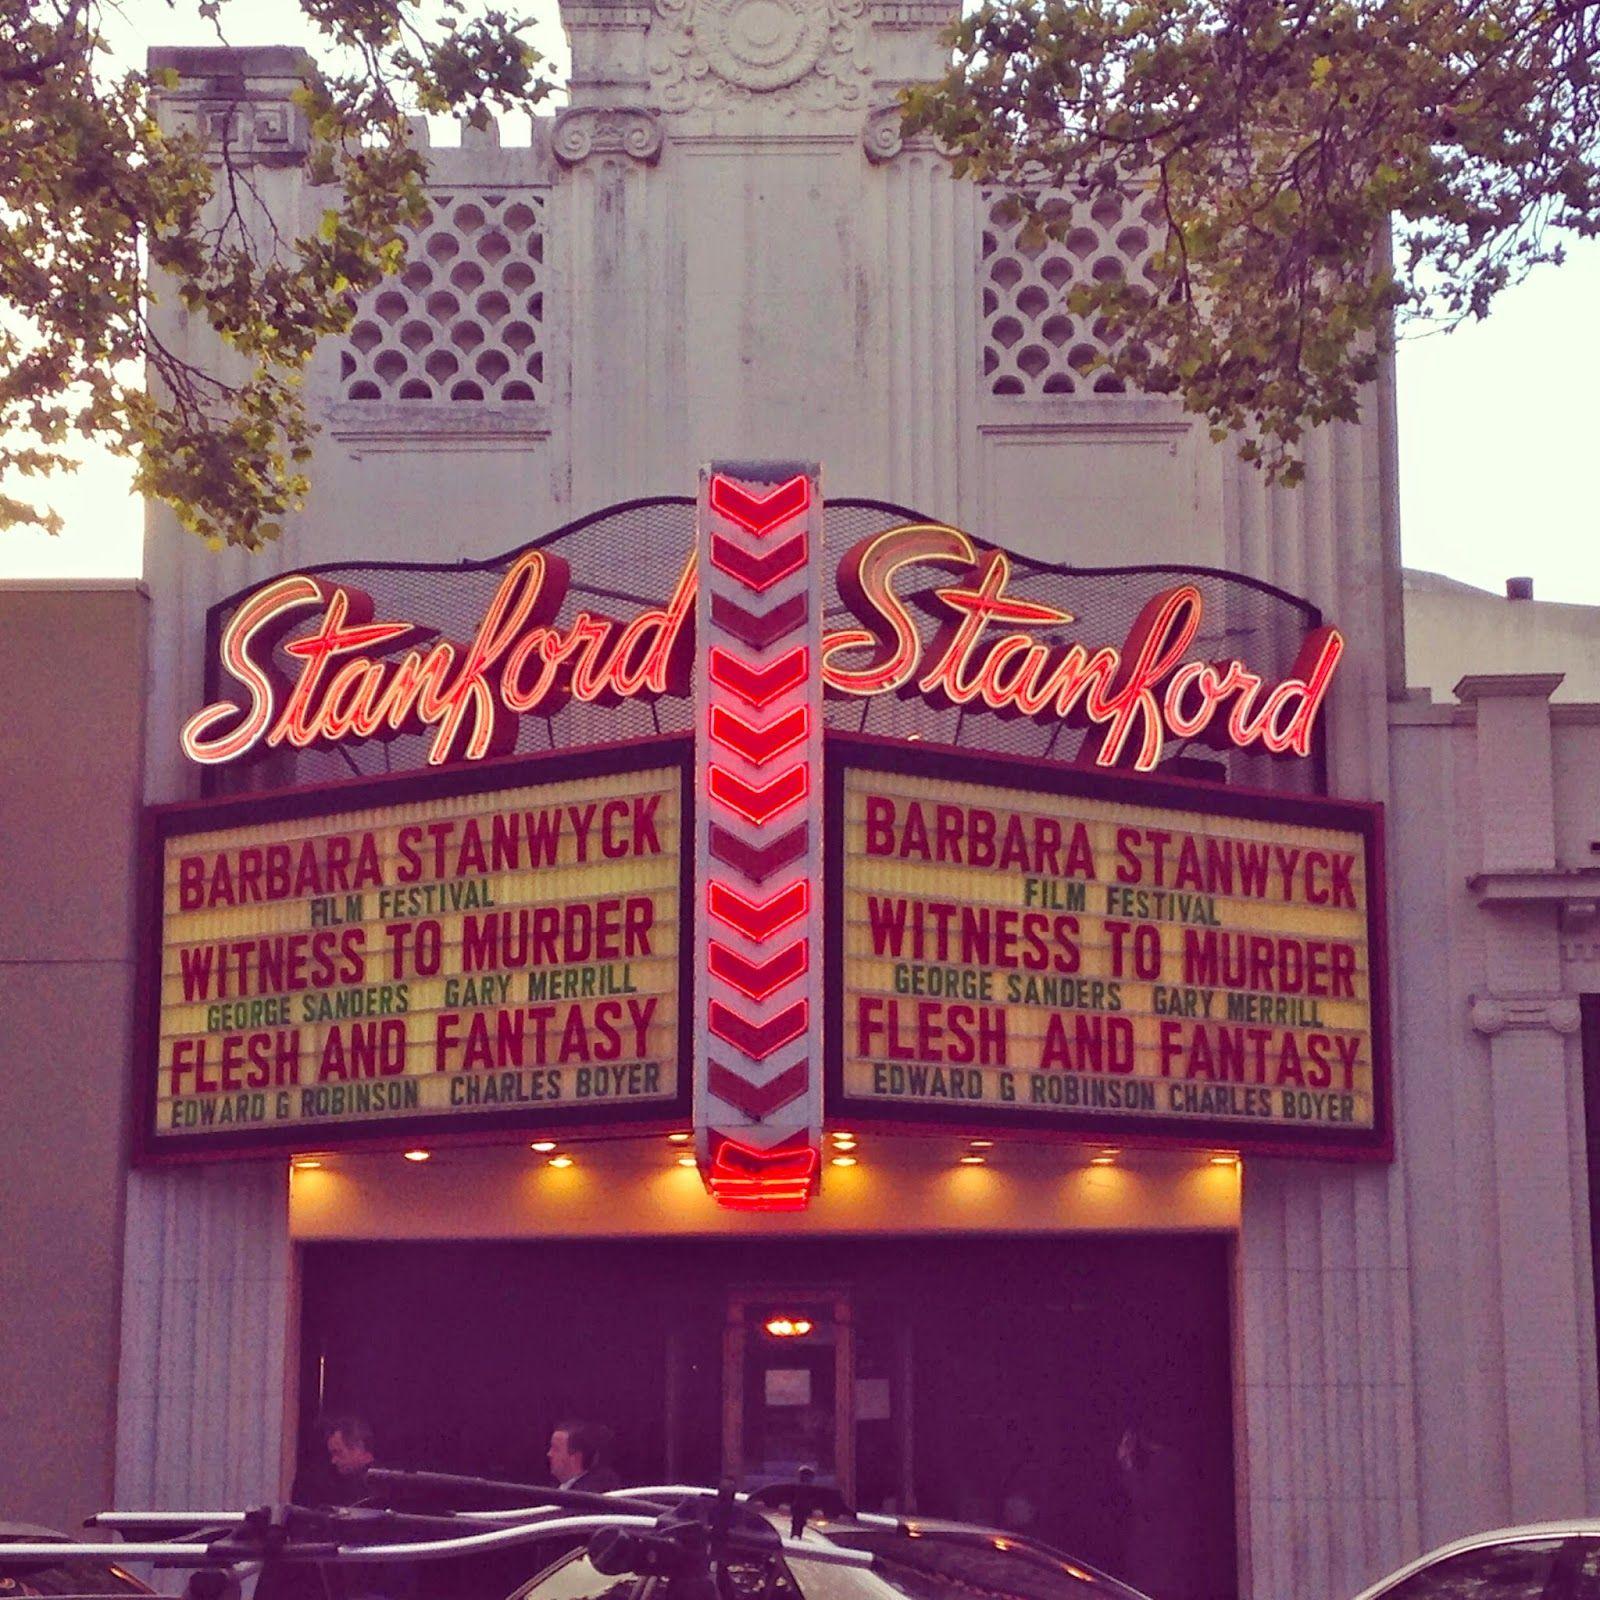 Stanford Theatre Theatre, Stanford, Gary merrill